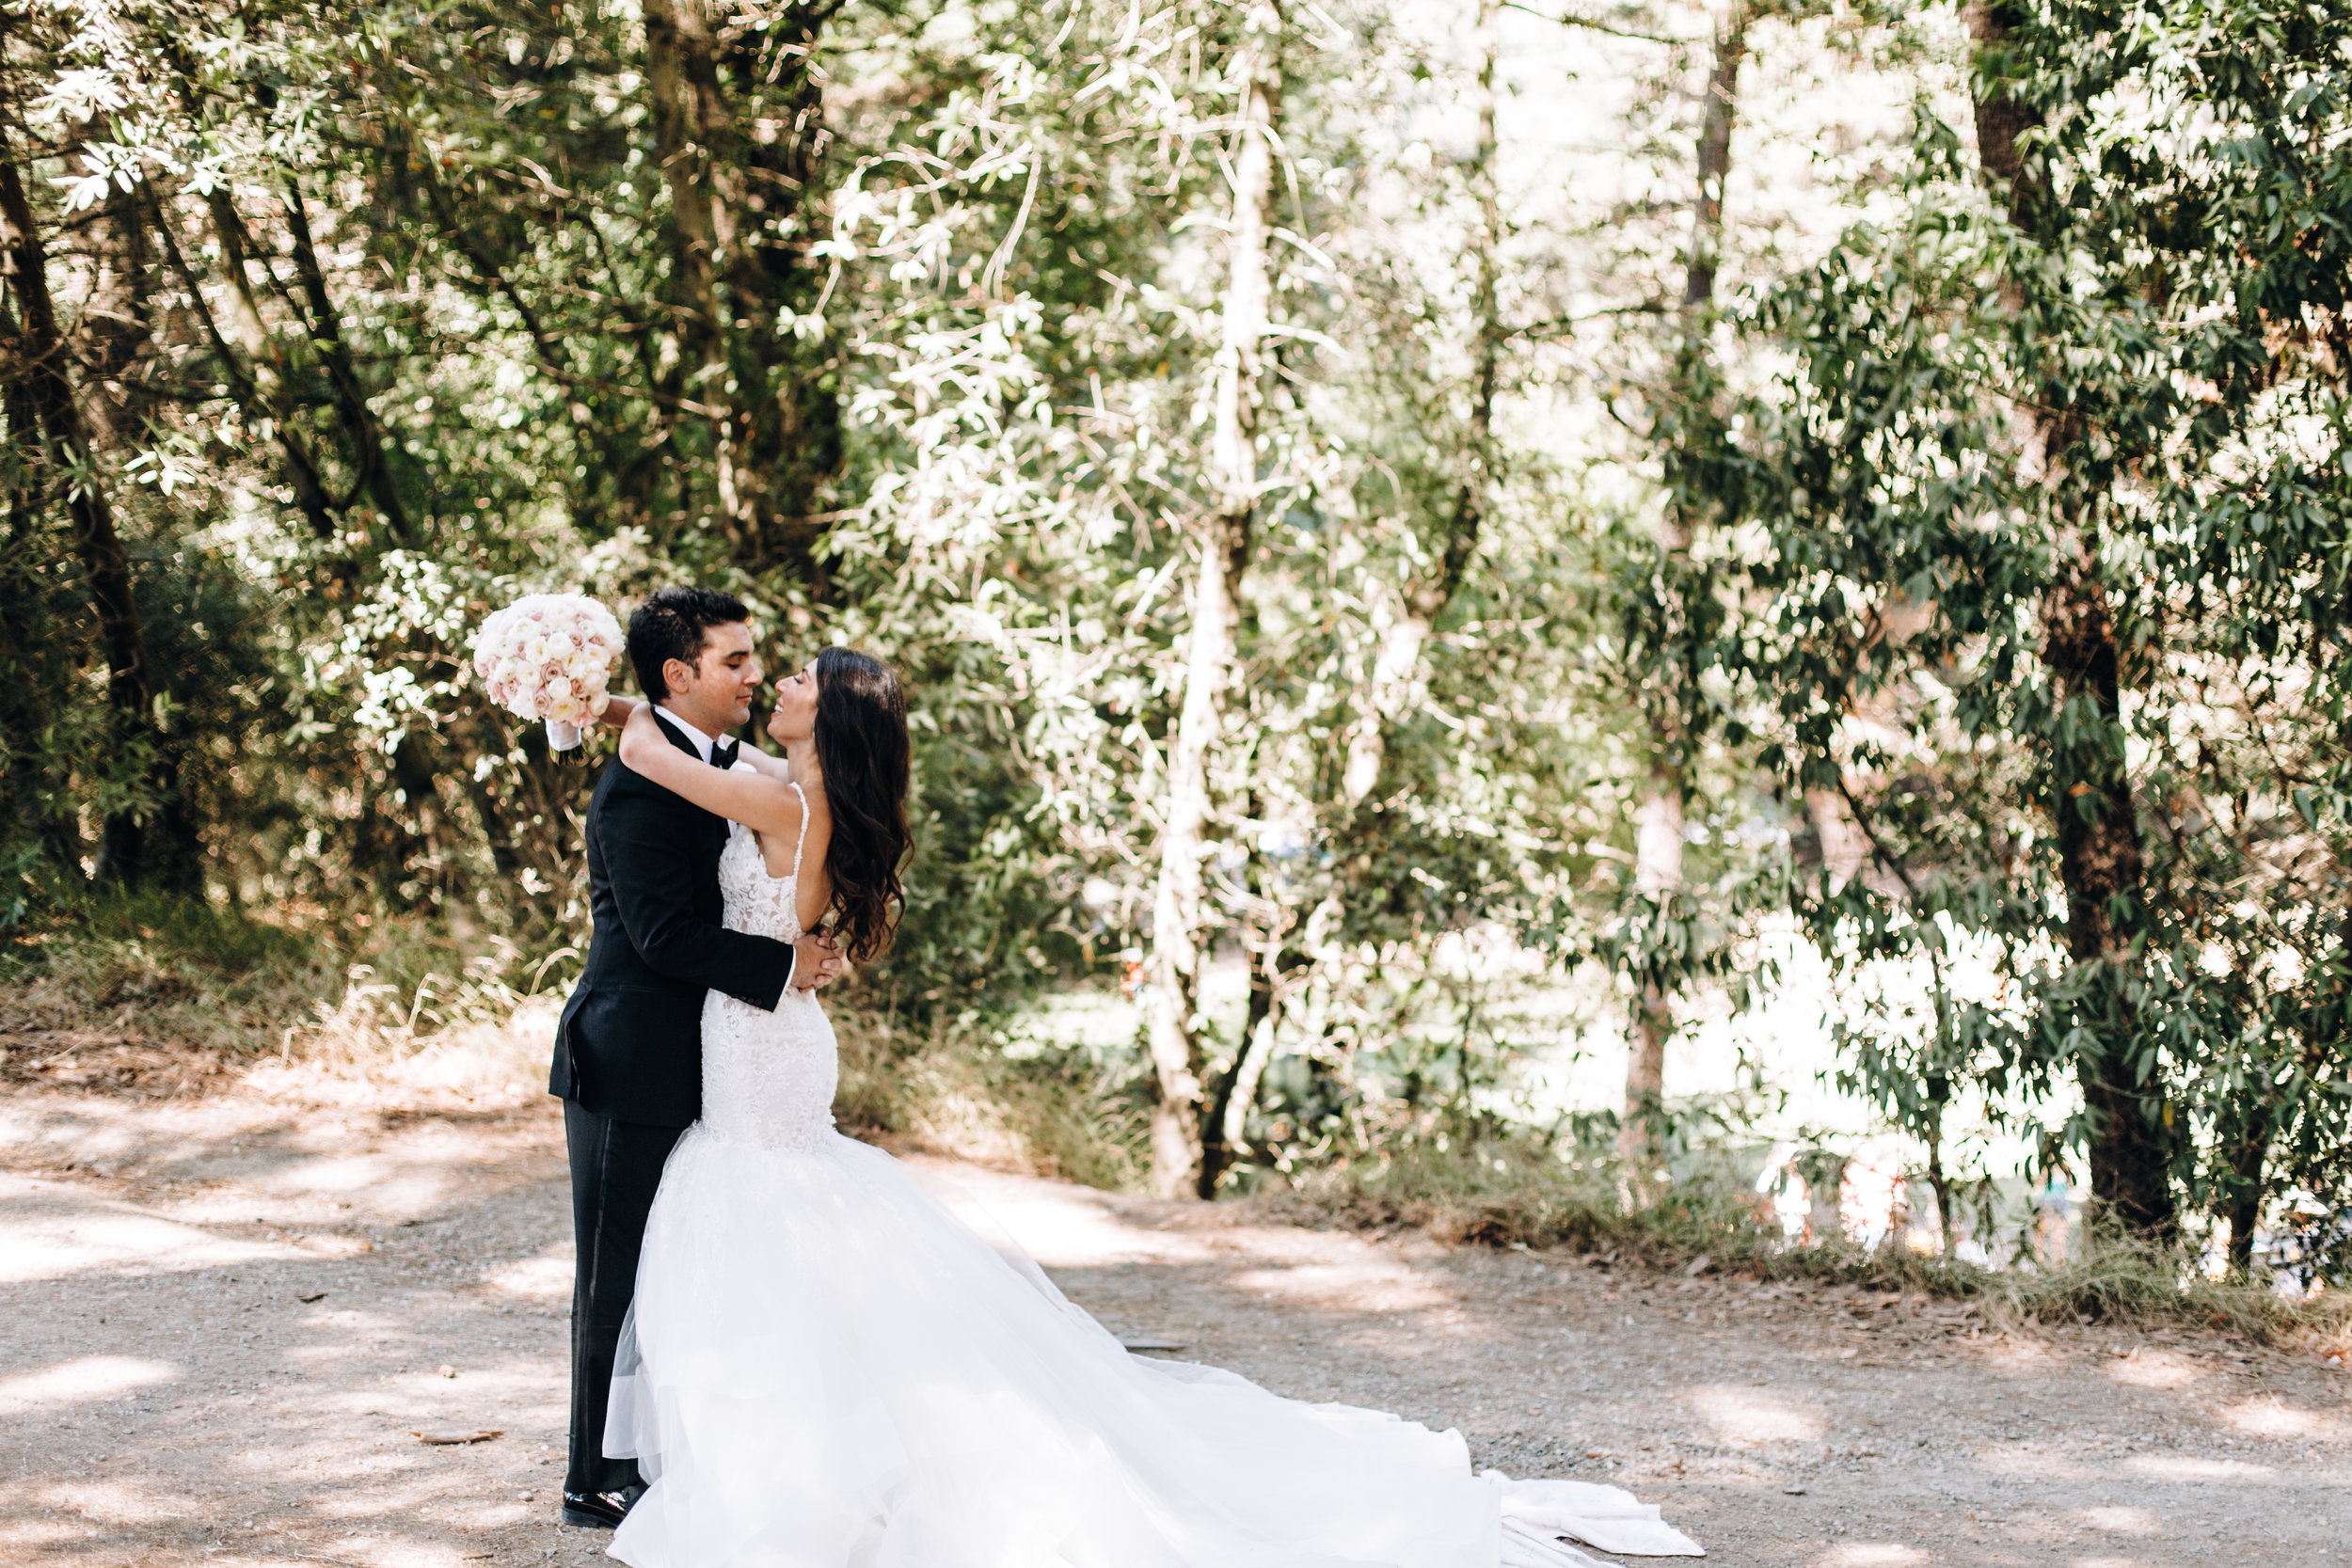 KaraNixonWeddings-GreekOrthodox-Oakland-Wedding-17.jpg